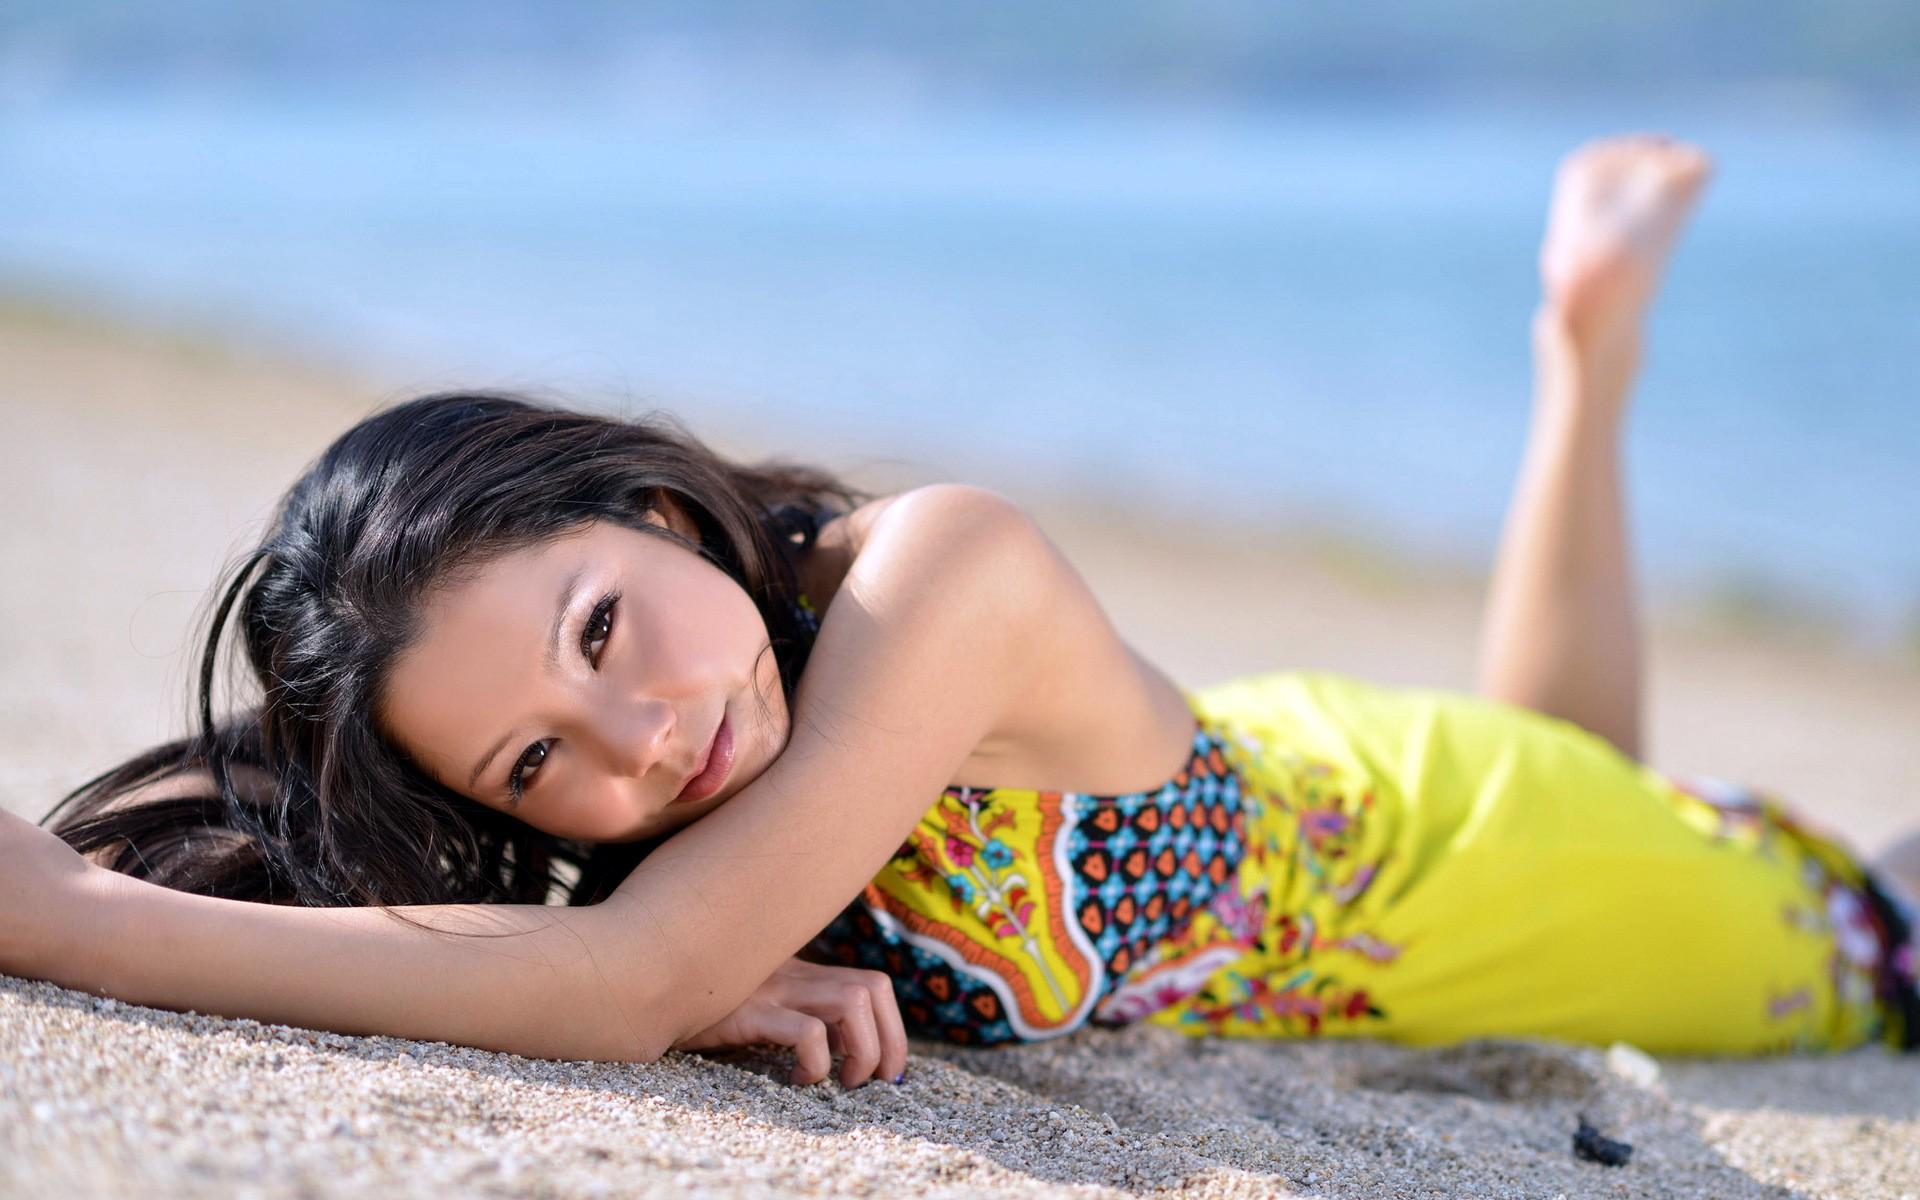 Chica asiática en la playa - 1920x1200